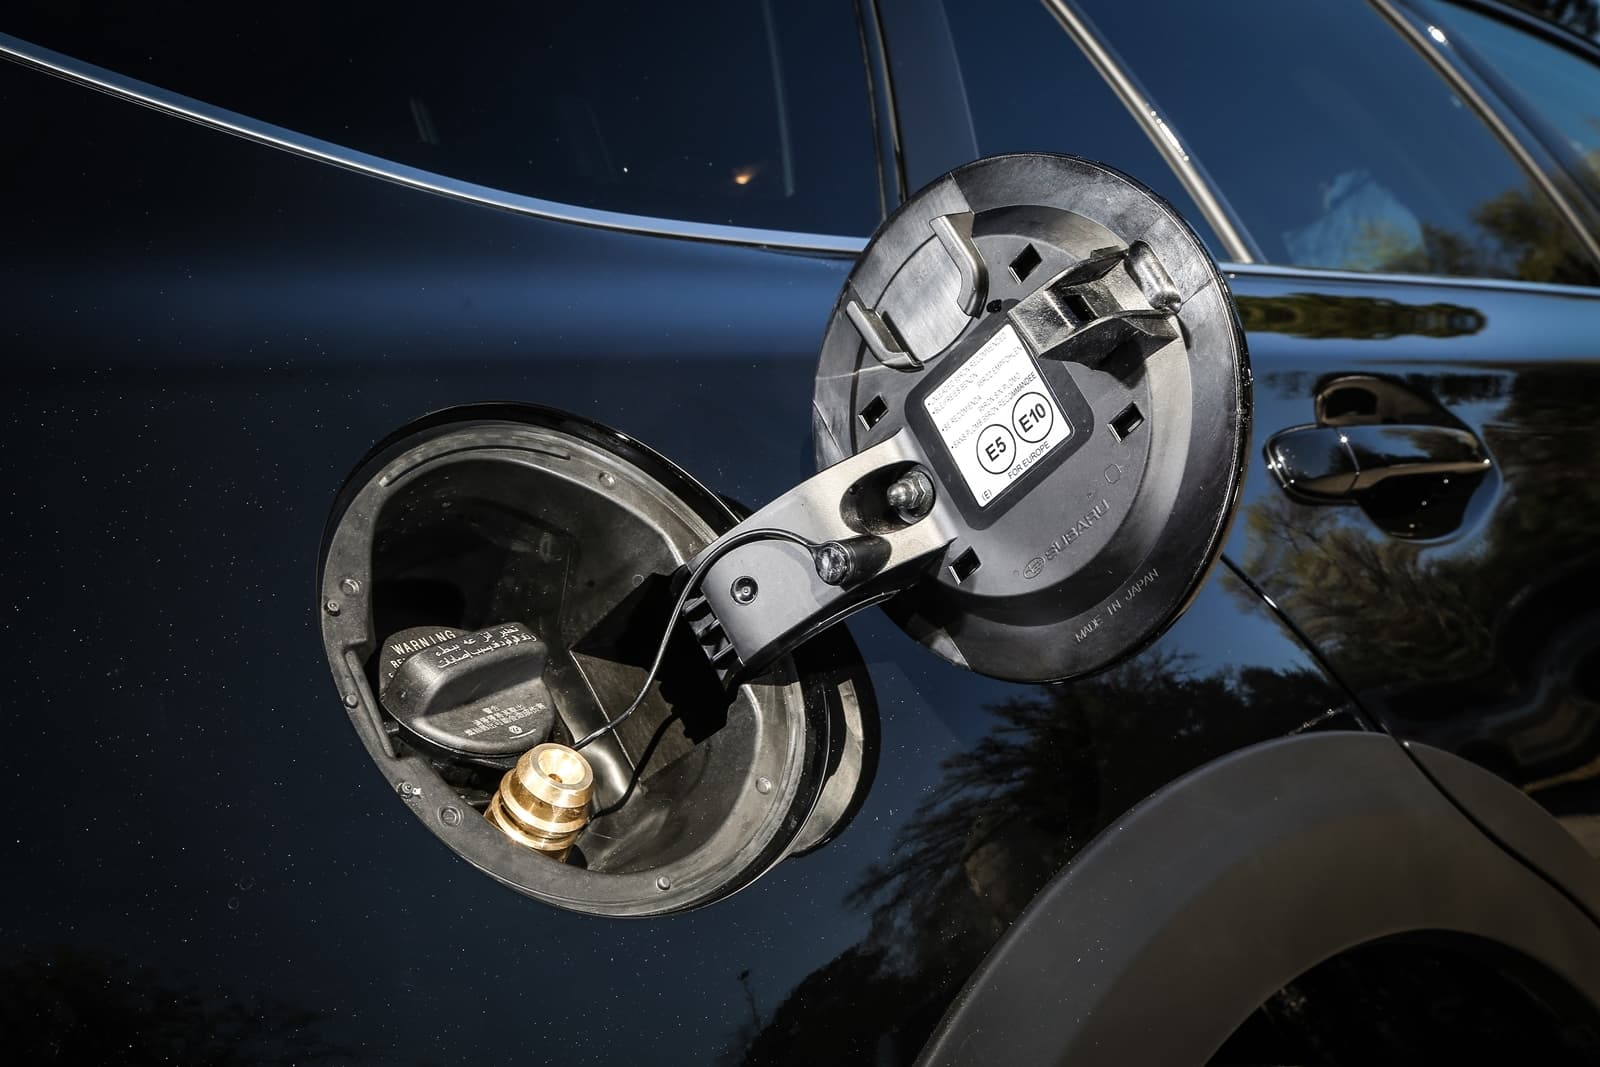 Subaru Outback 0319 Glp Gasolina Etanol 007